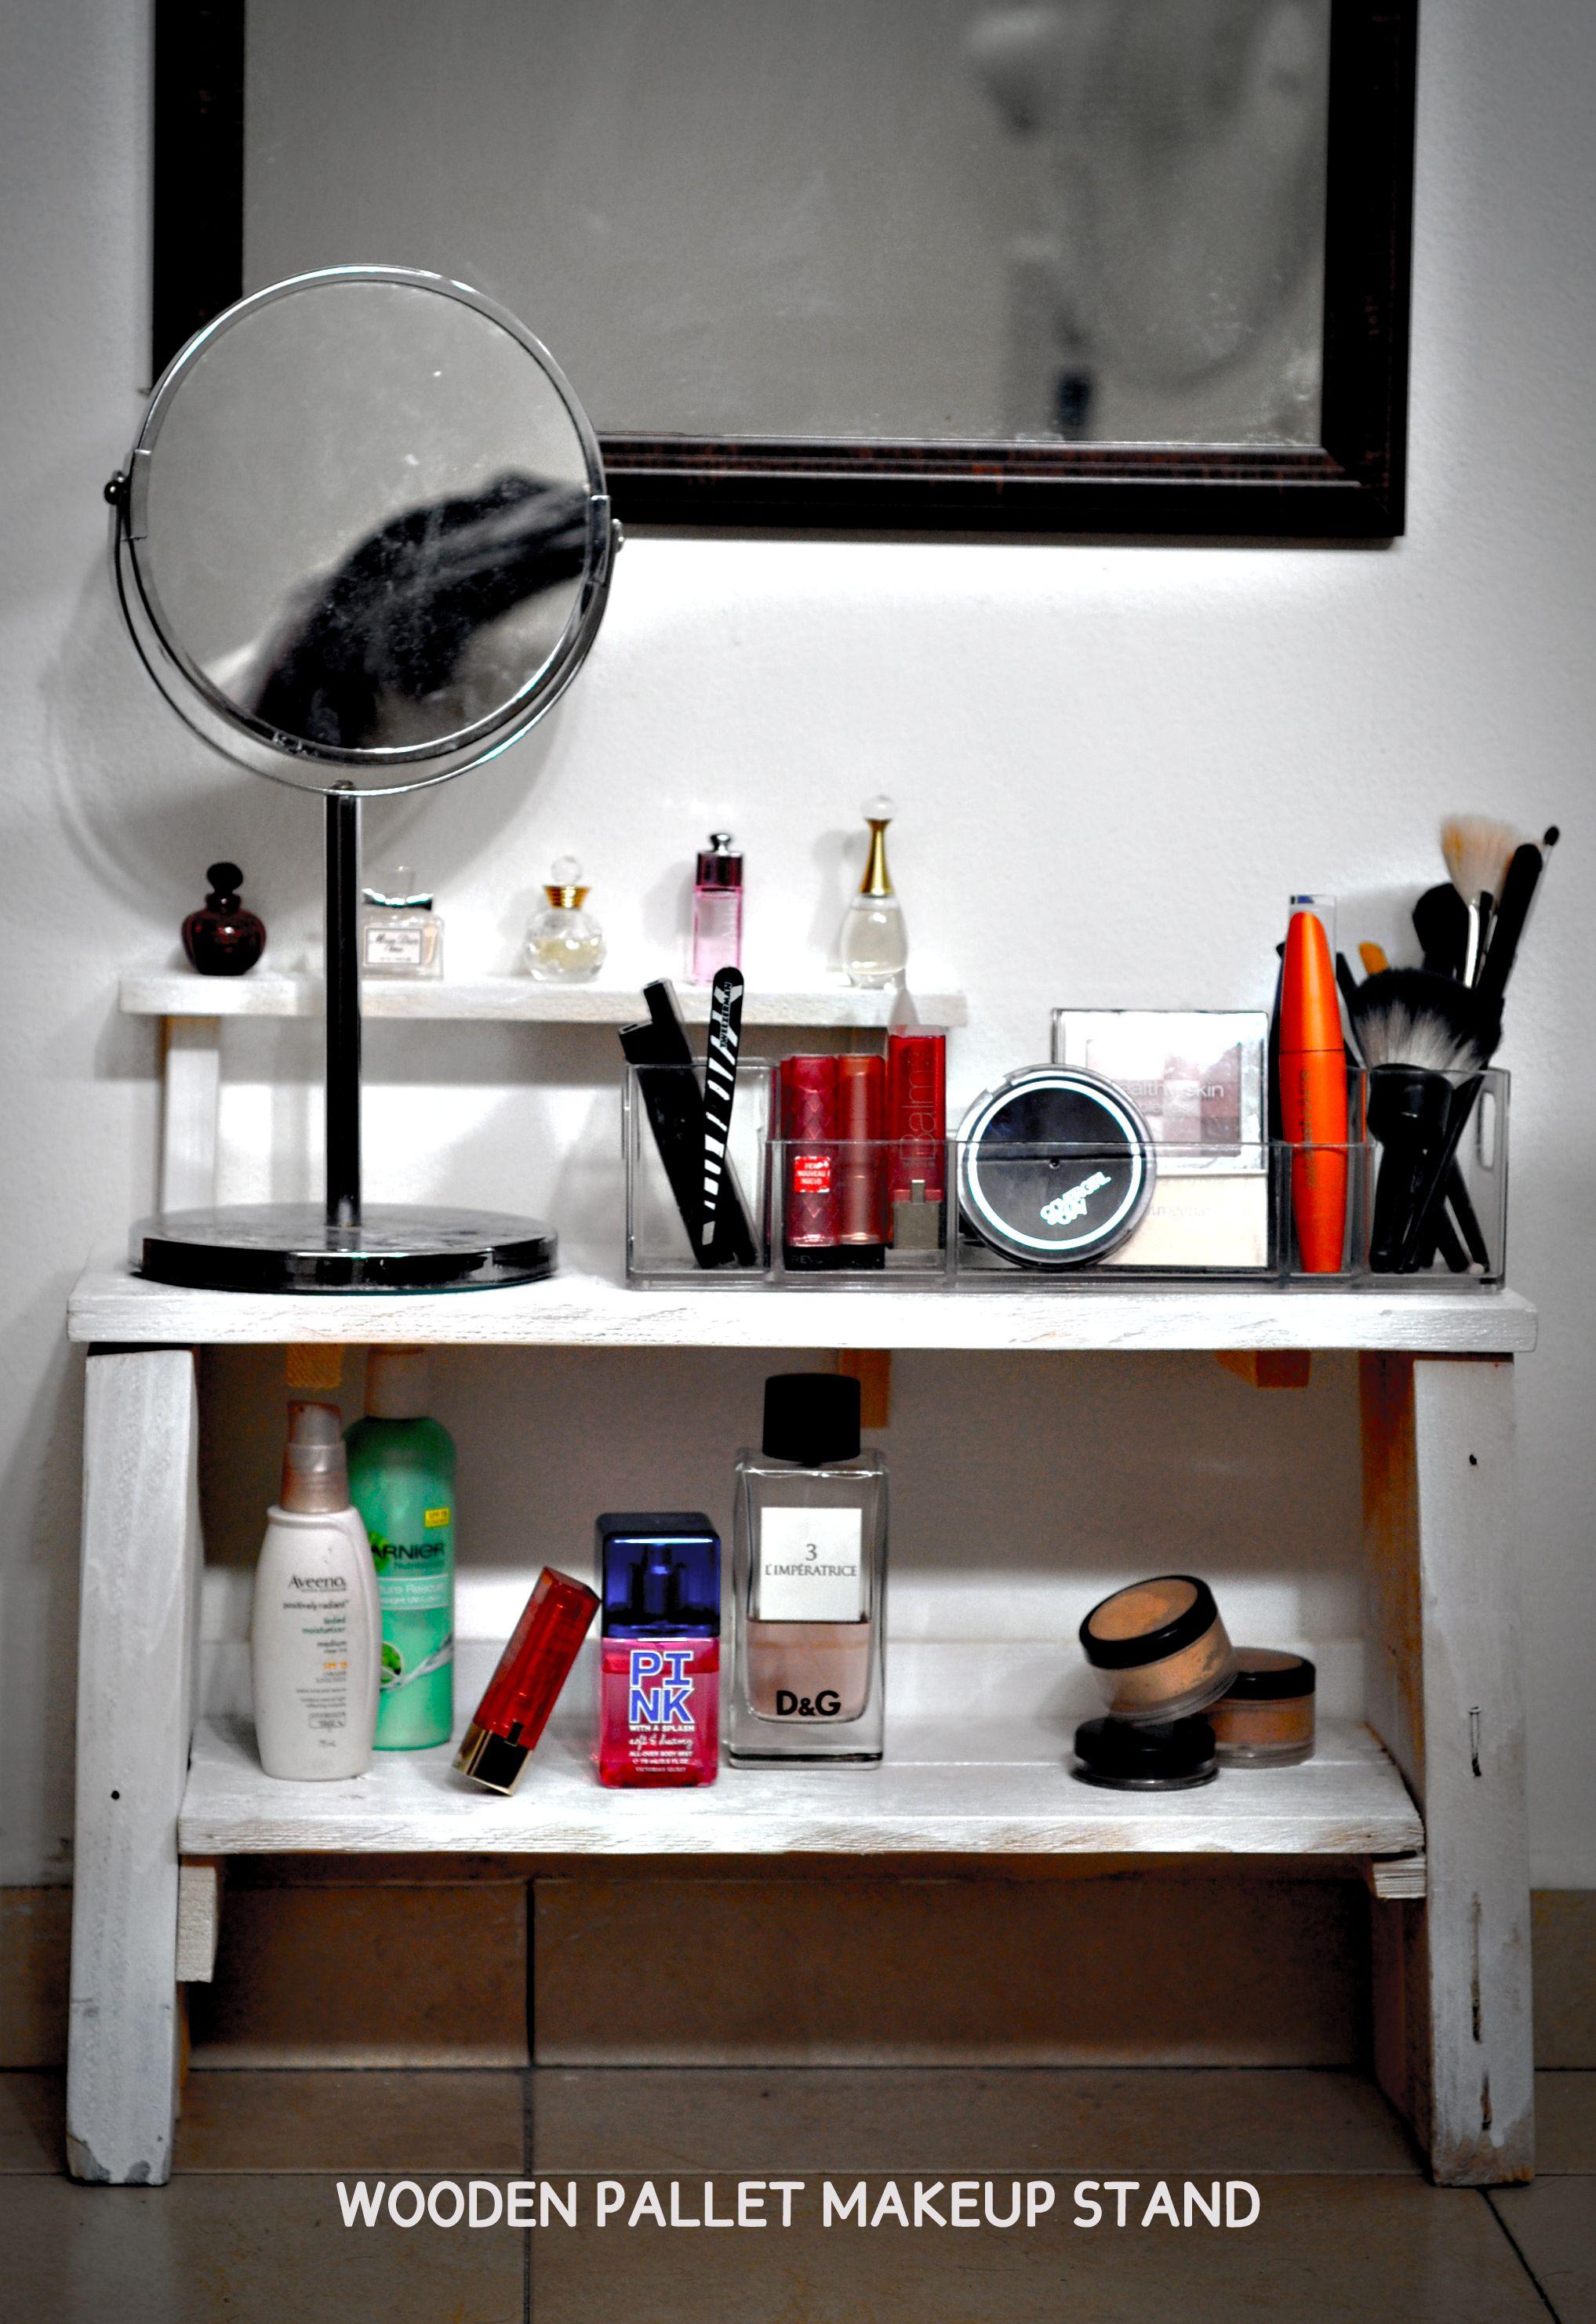 Diy pallet wood bathroom vanity pallet shelf for bathroom vanity diy - Wooden Pallet Makeup Stand Or Vanity Cool Bedroom Ideasdiy Bedroommakeup Craftspallet Bathroombathroom